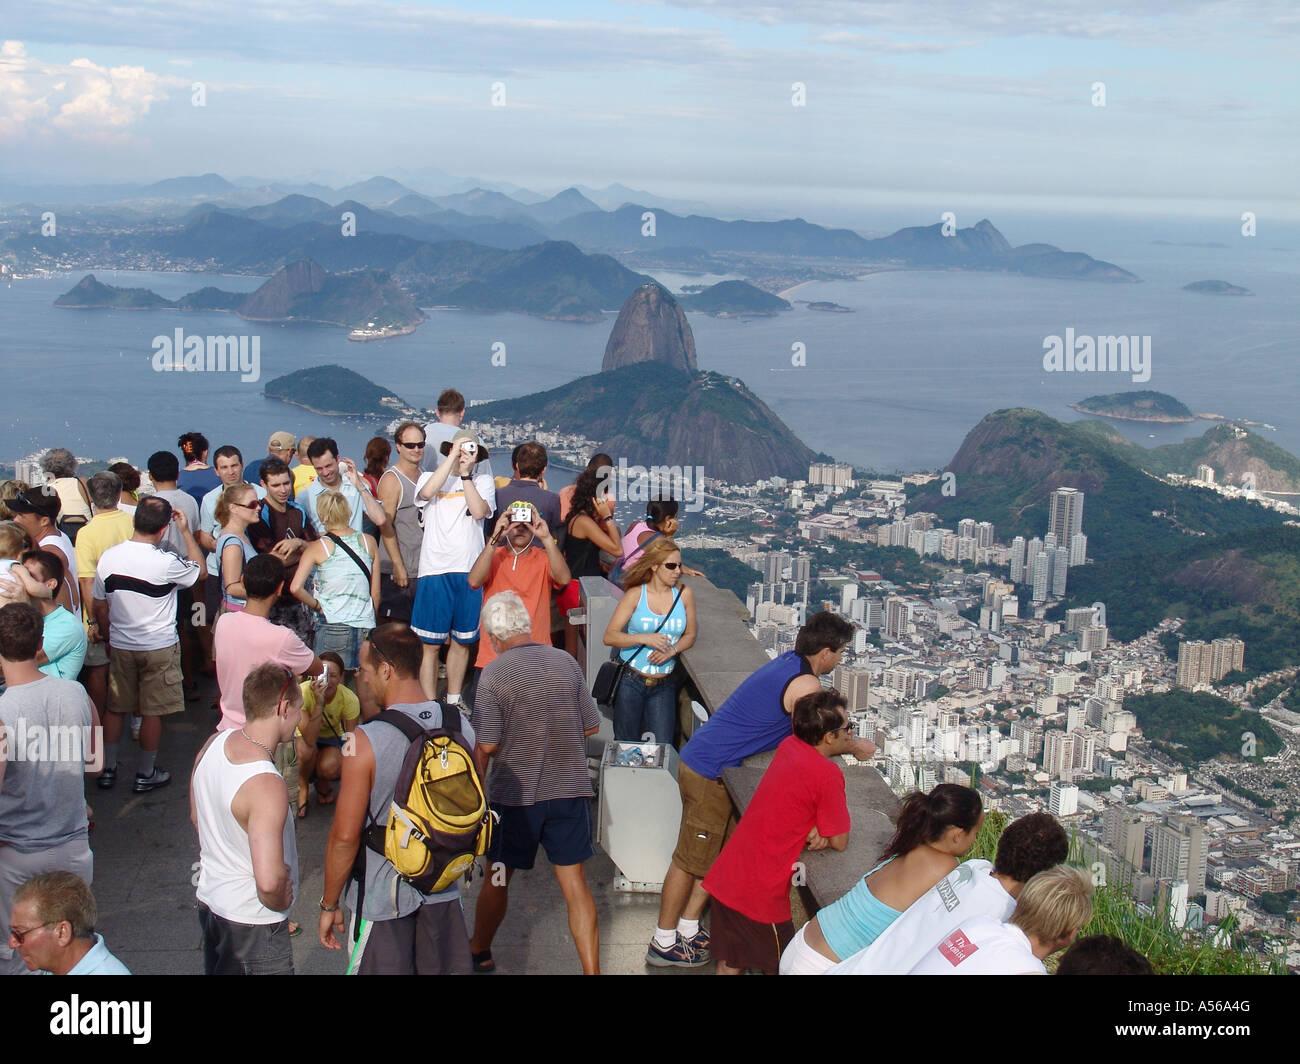 Painet iy8157 brazil tourists enjoying panorama rio janeiro corcovado peak site statue christ redeemer 2005 country Stock Photo